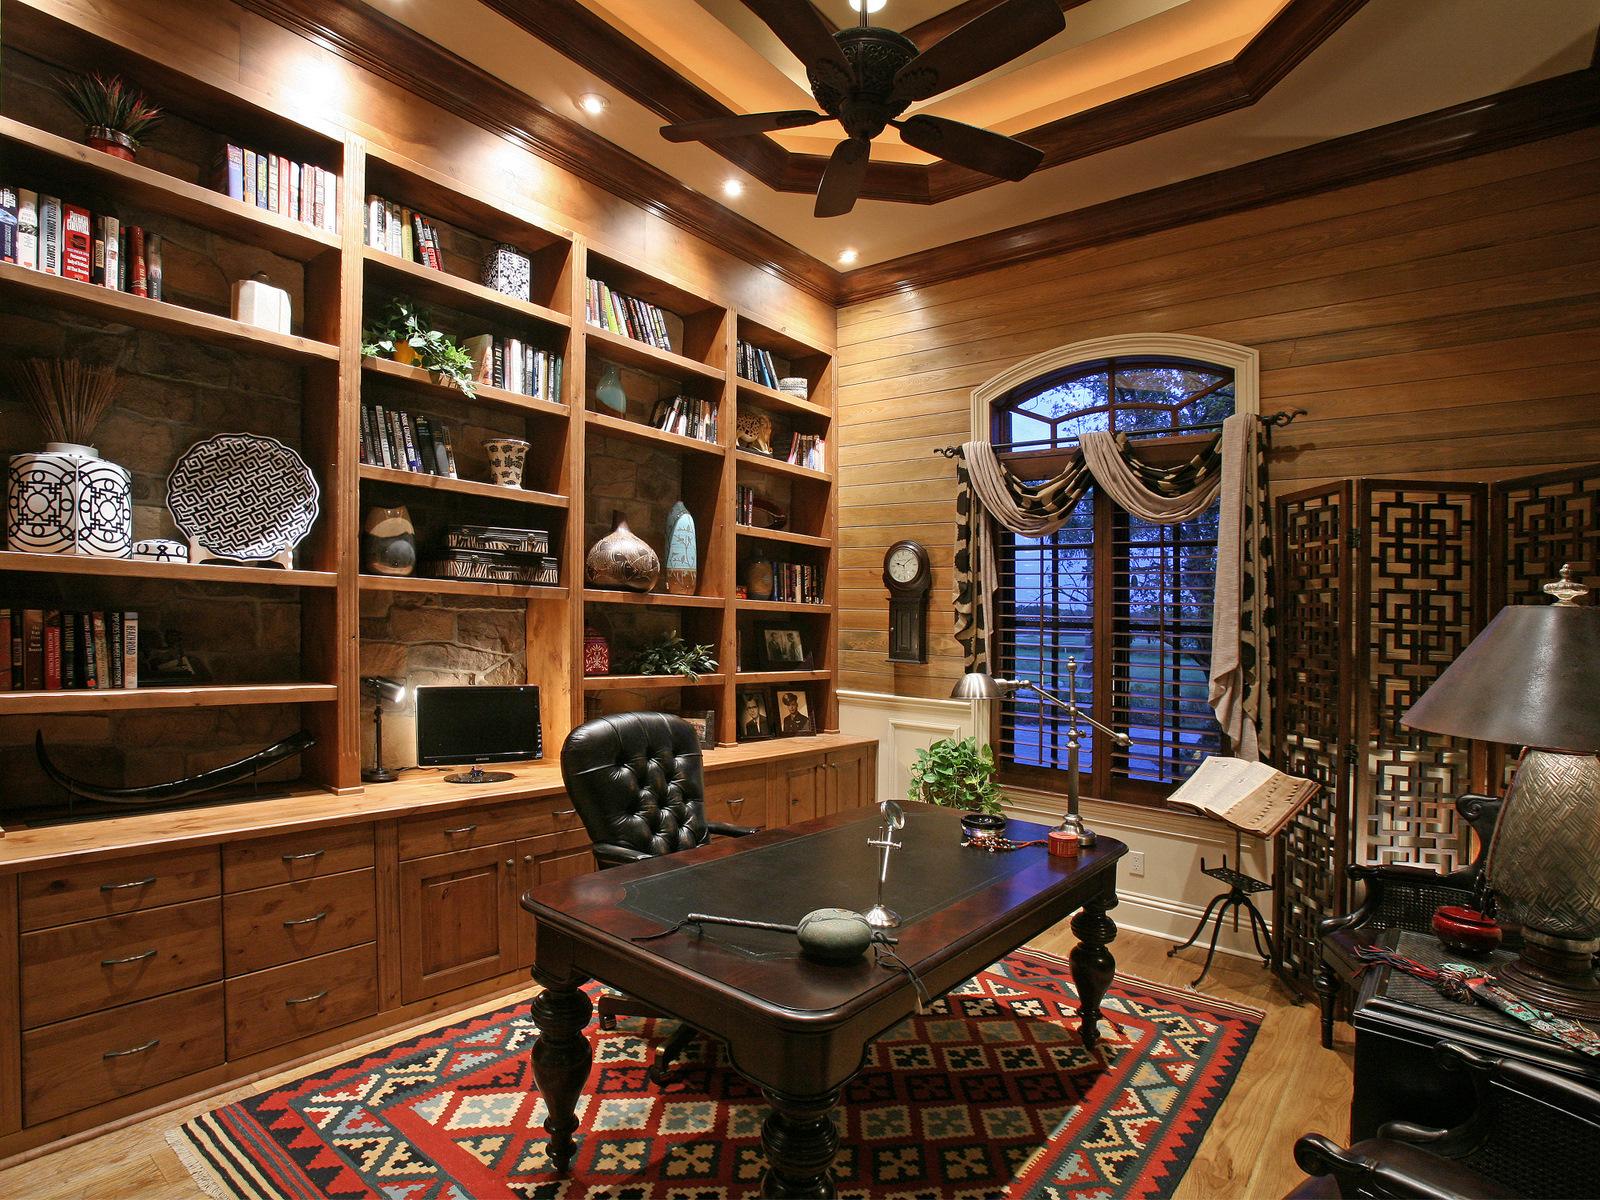 Interior design byPeggy Oberlin Interiors